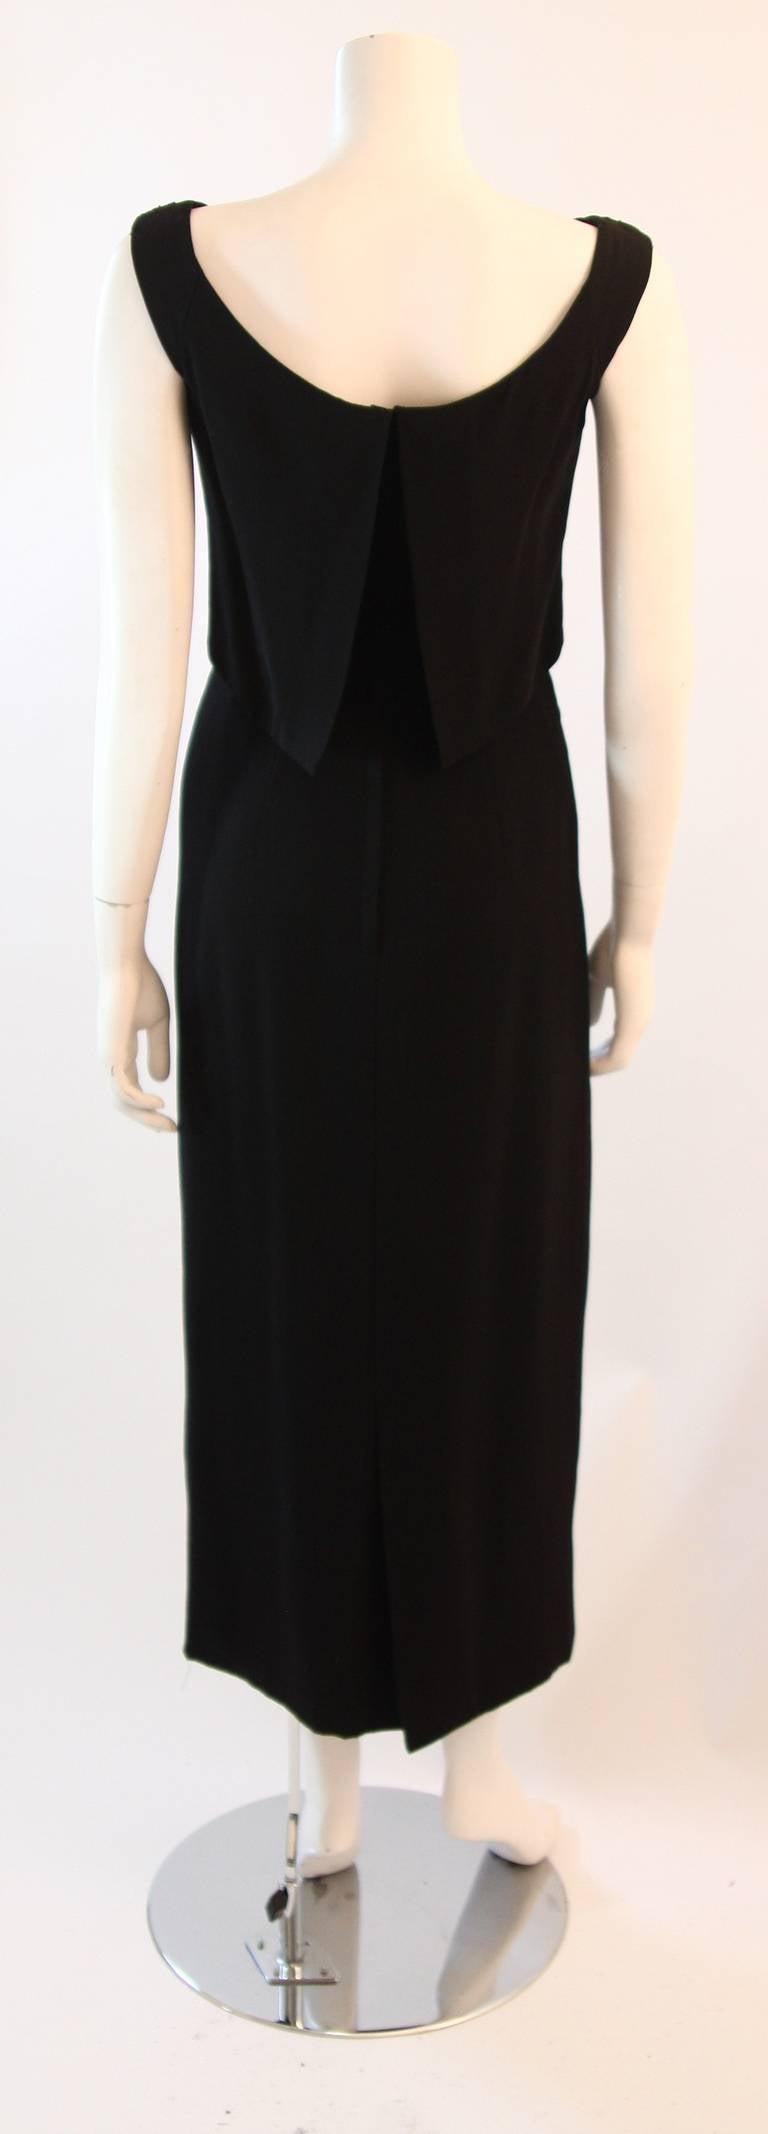 Dorothy O'Hara Black Silk Crepe Gown with Drape front split back design 9